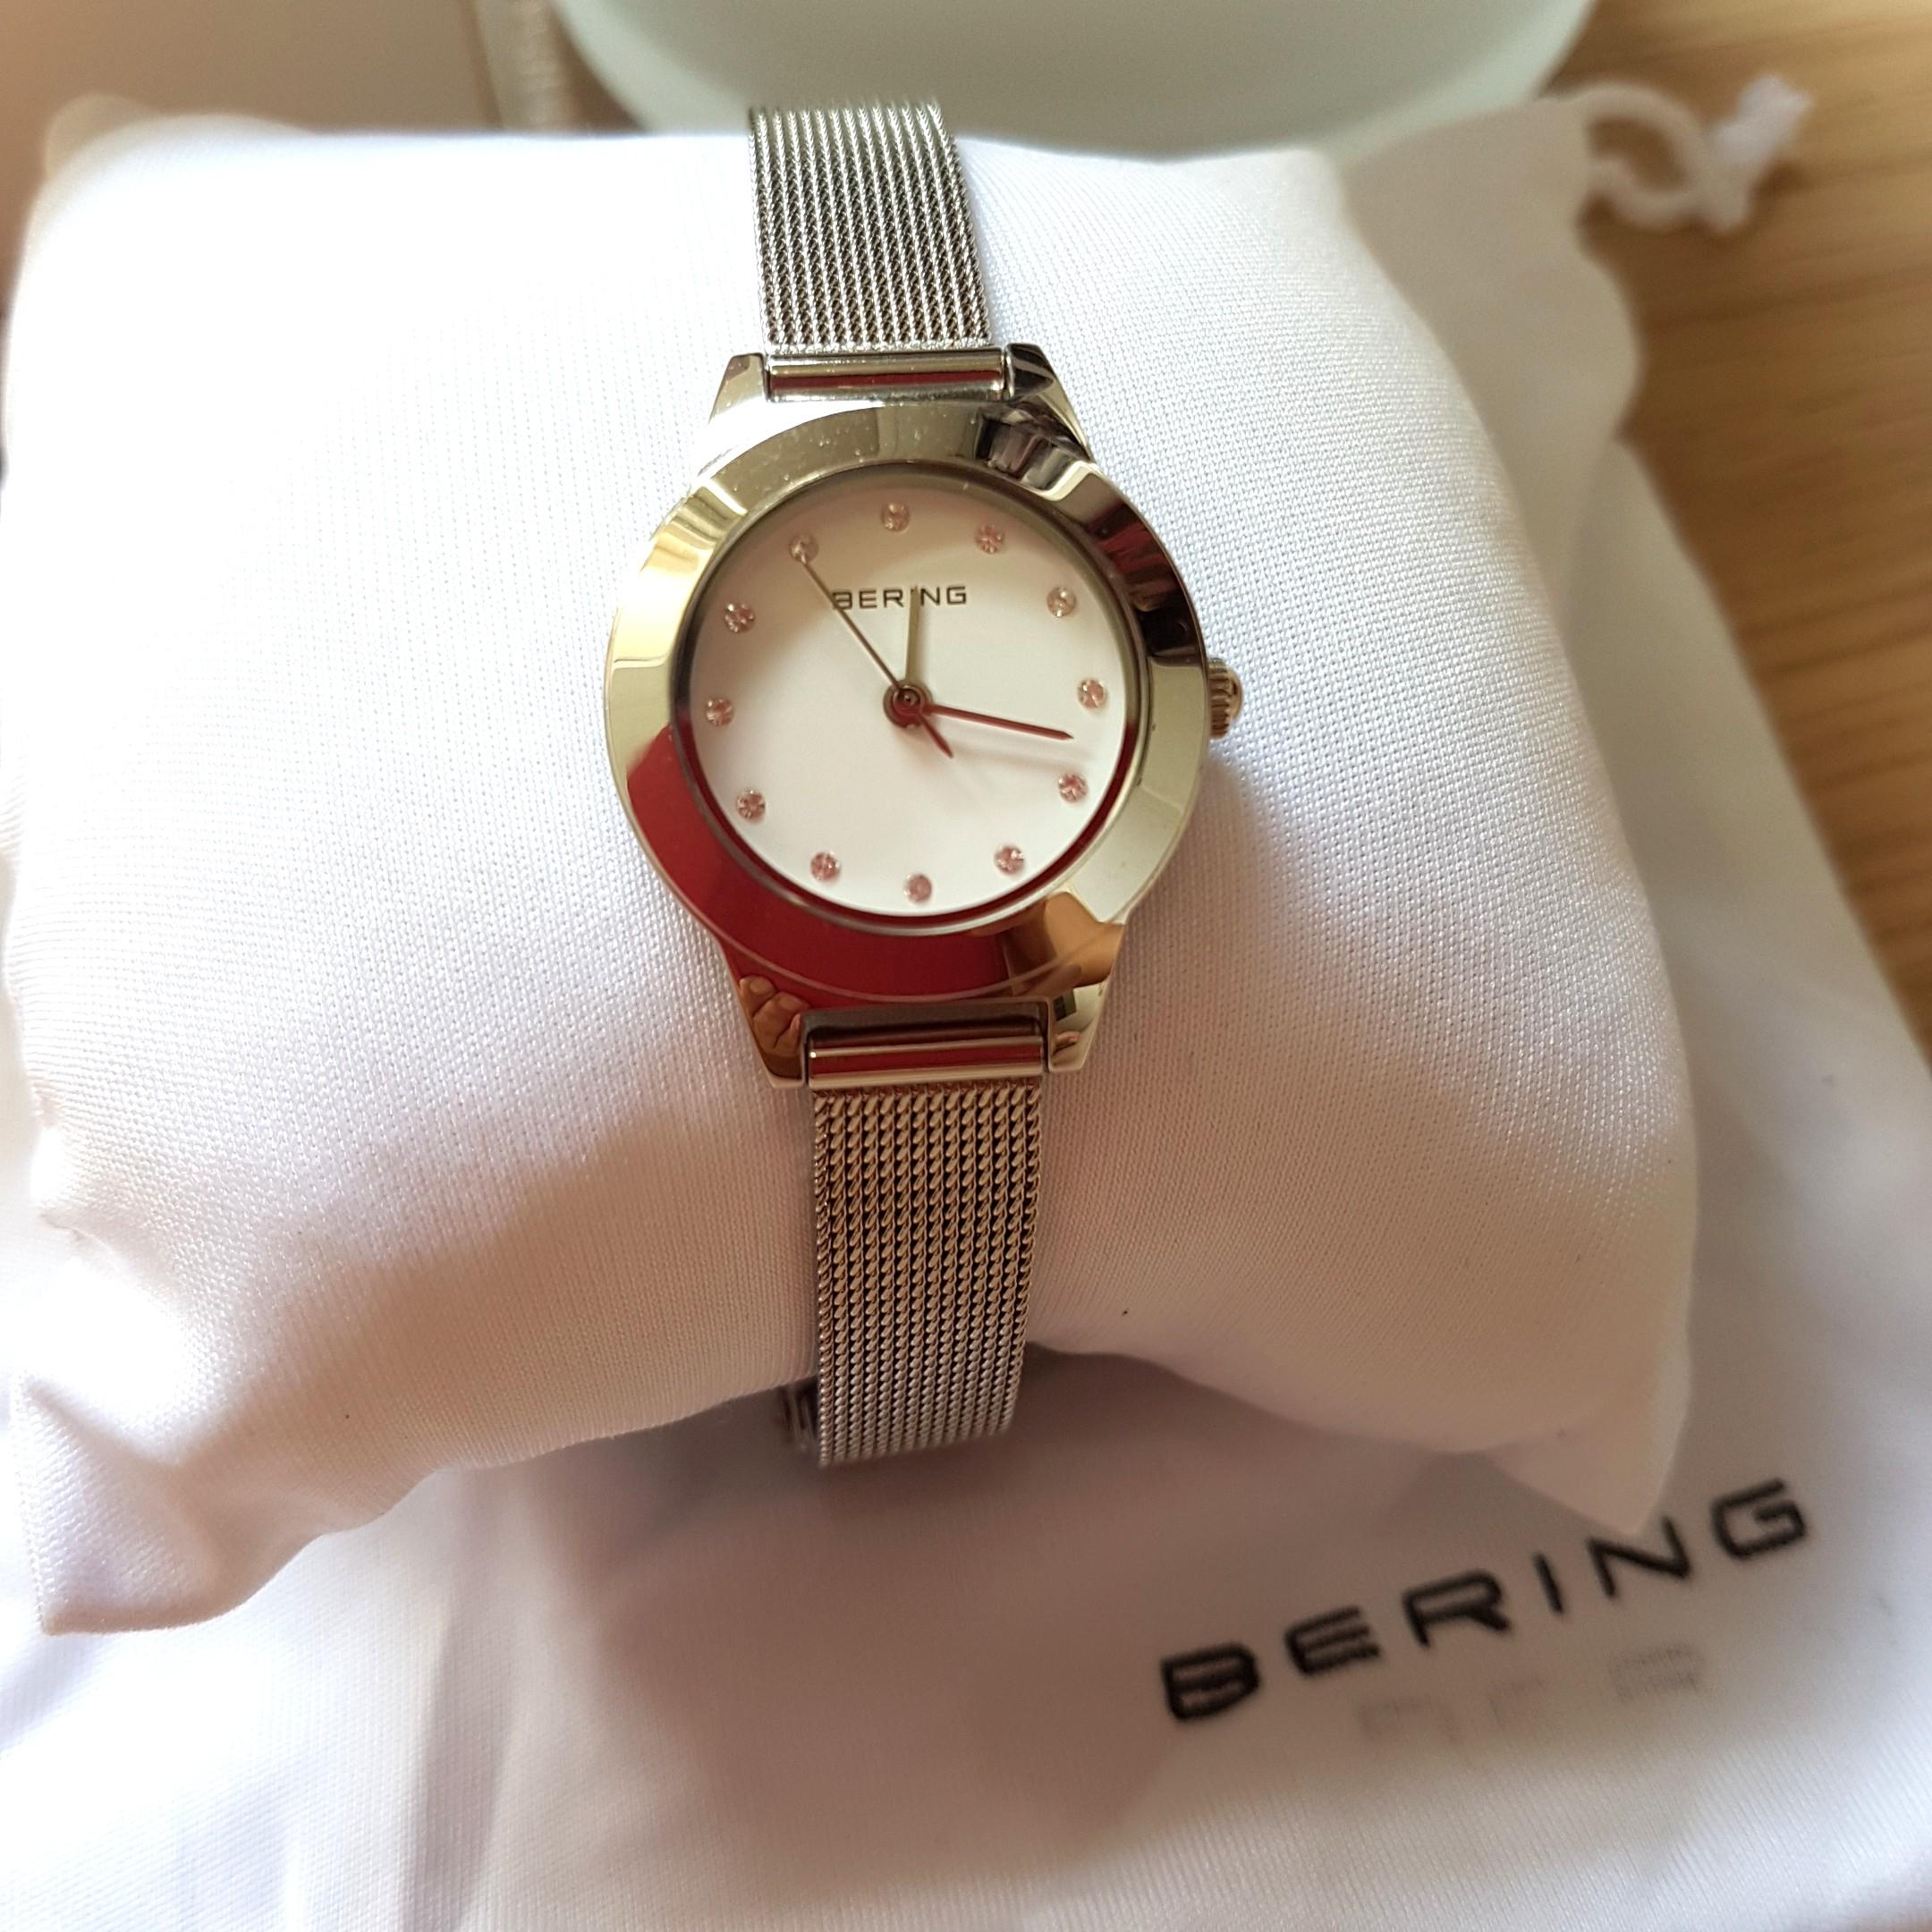 78611aa8539 Home · Women s Fashion · Watches. photo photo photo photo